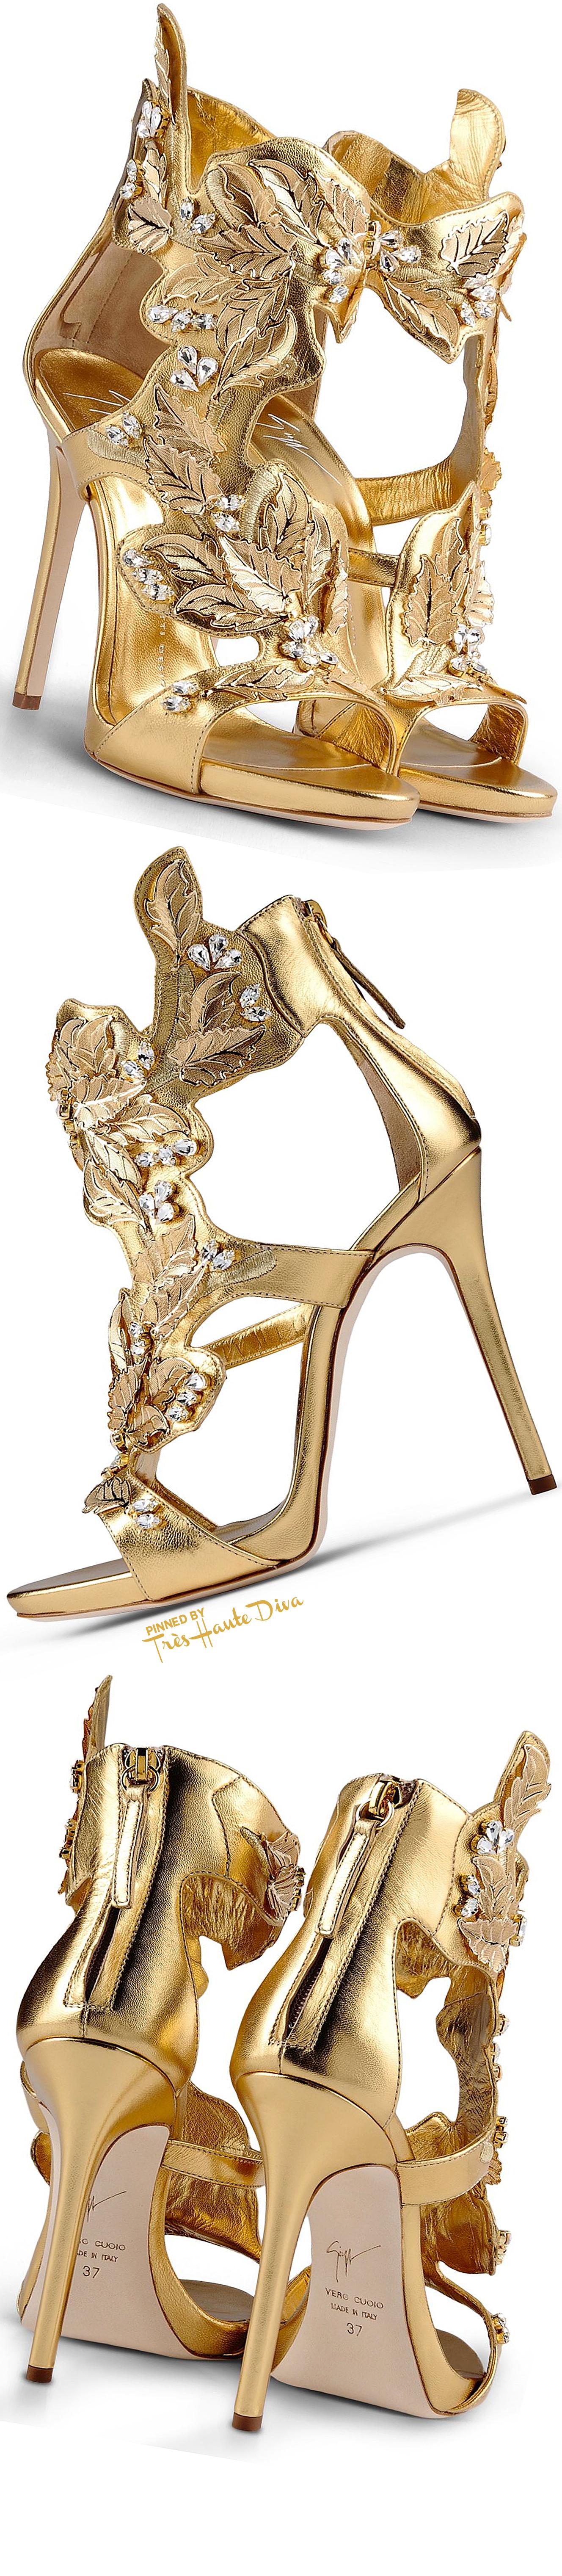 Giuseppe Zanotti Gold and Rhinestone Embellished Nappa Leather Sandals